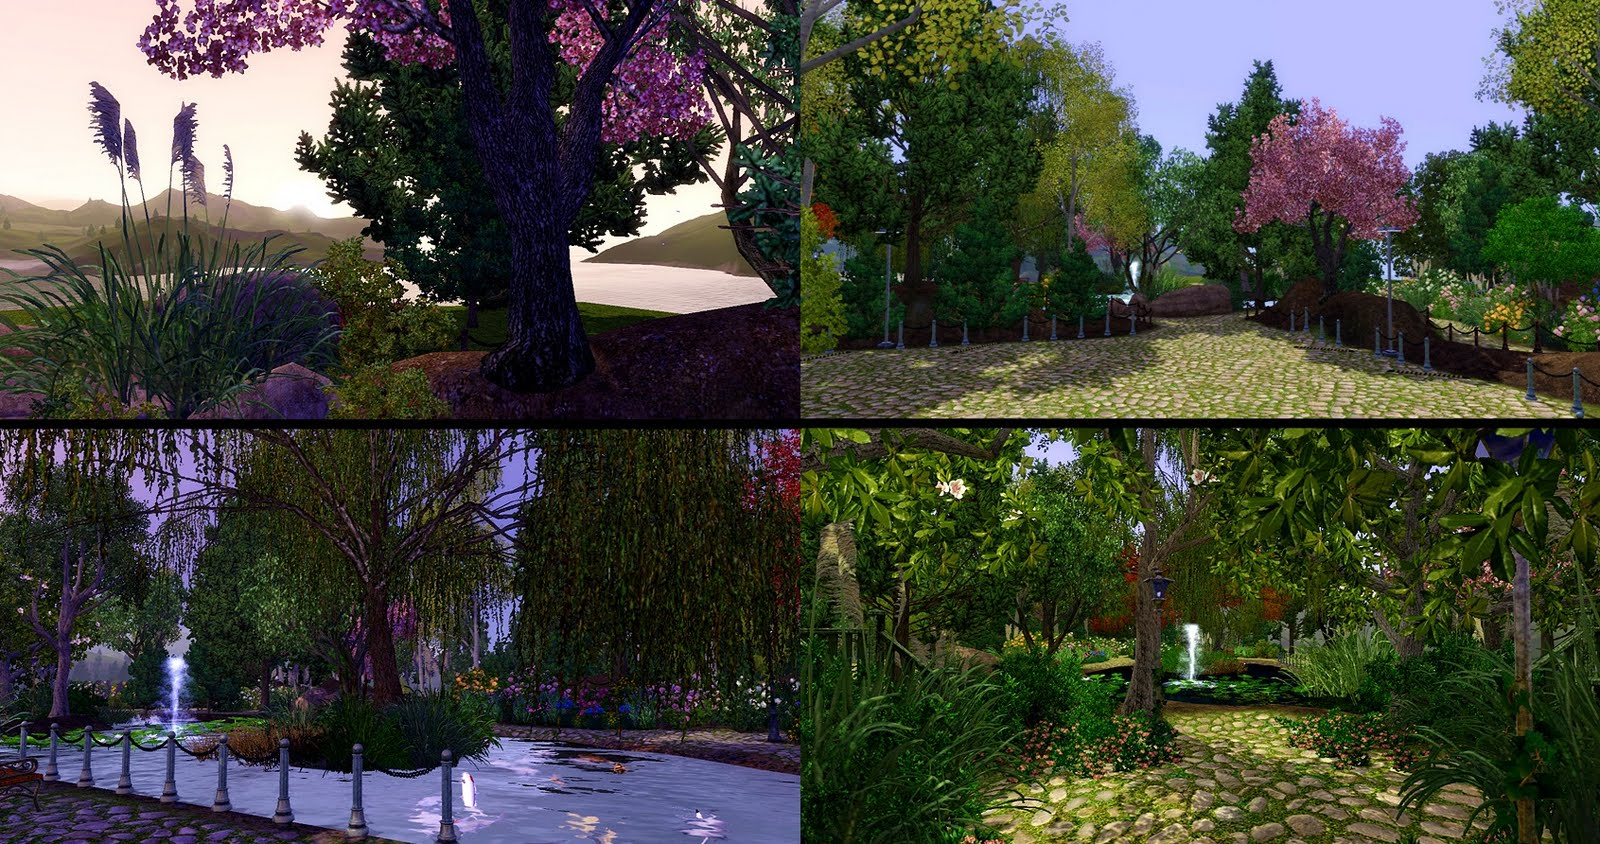 BotanicGardens2.jpg